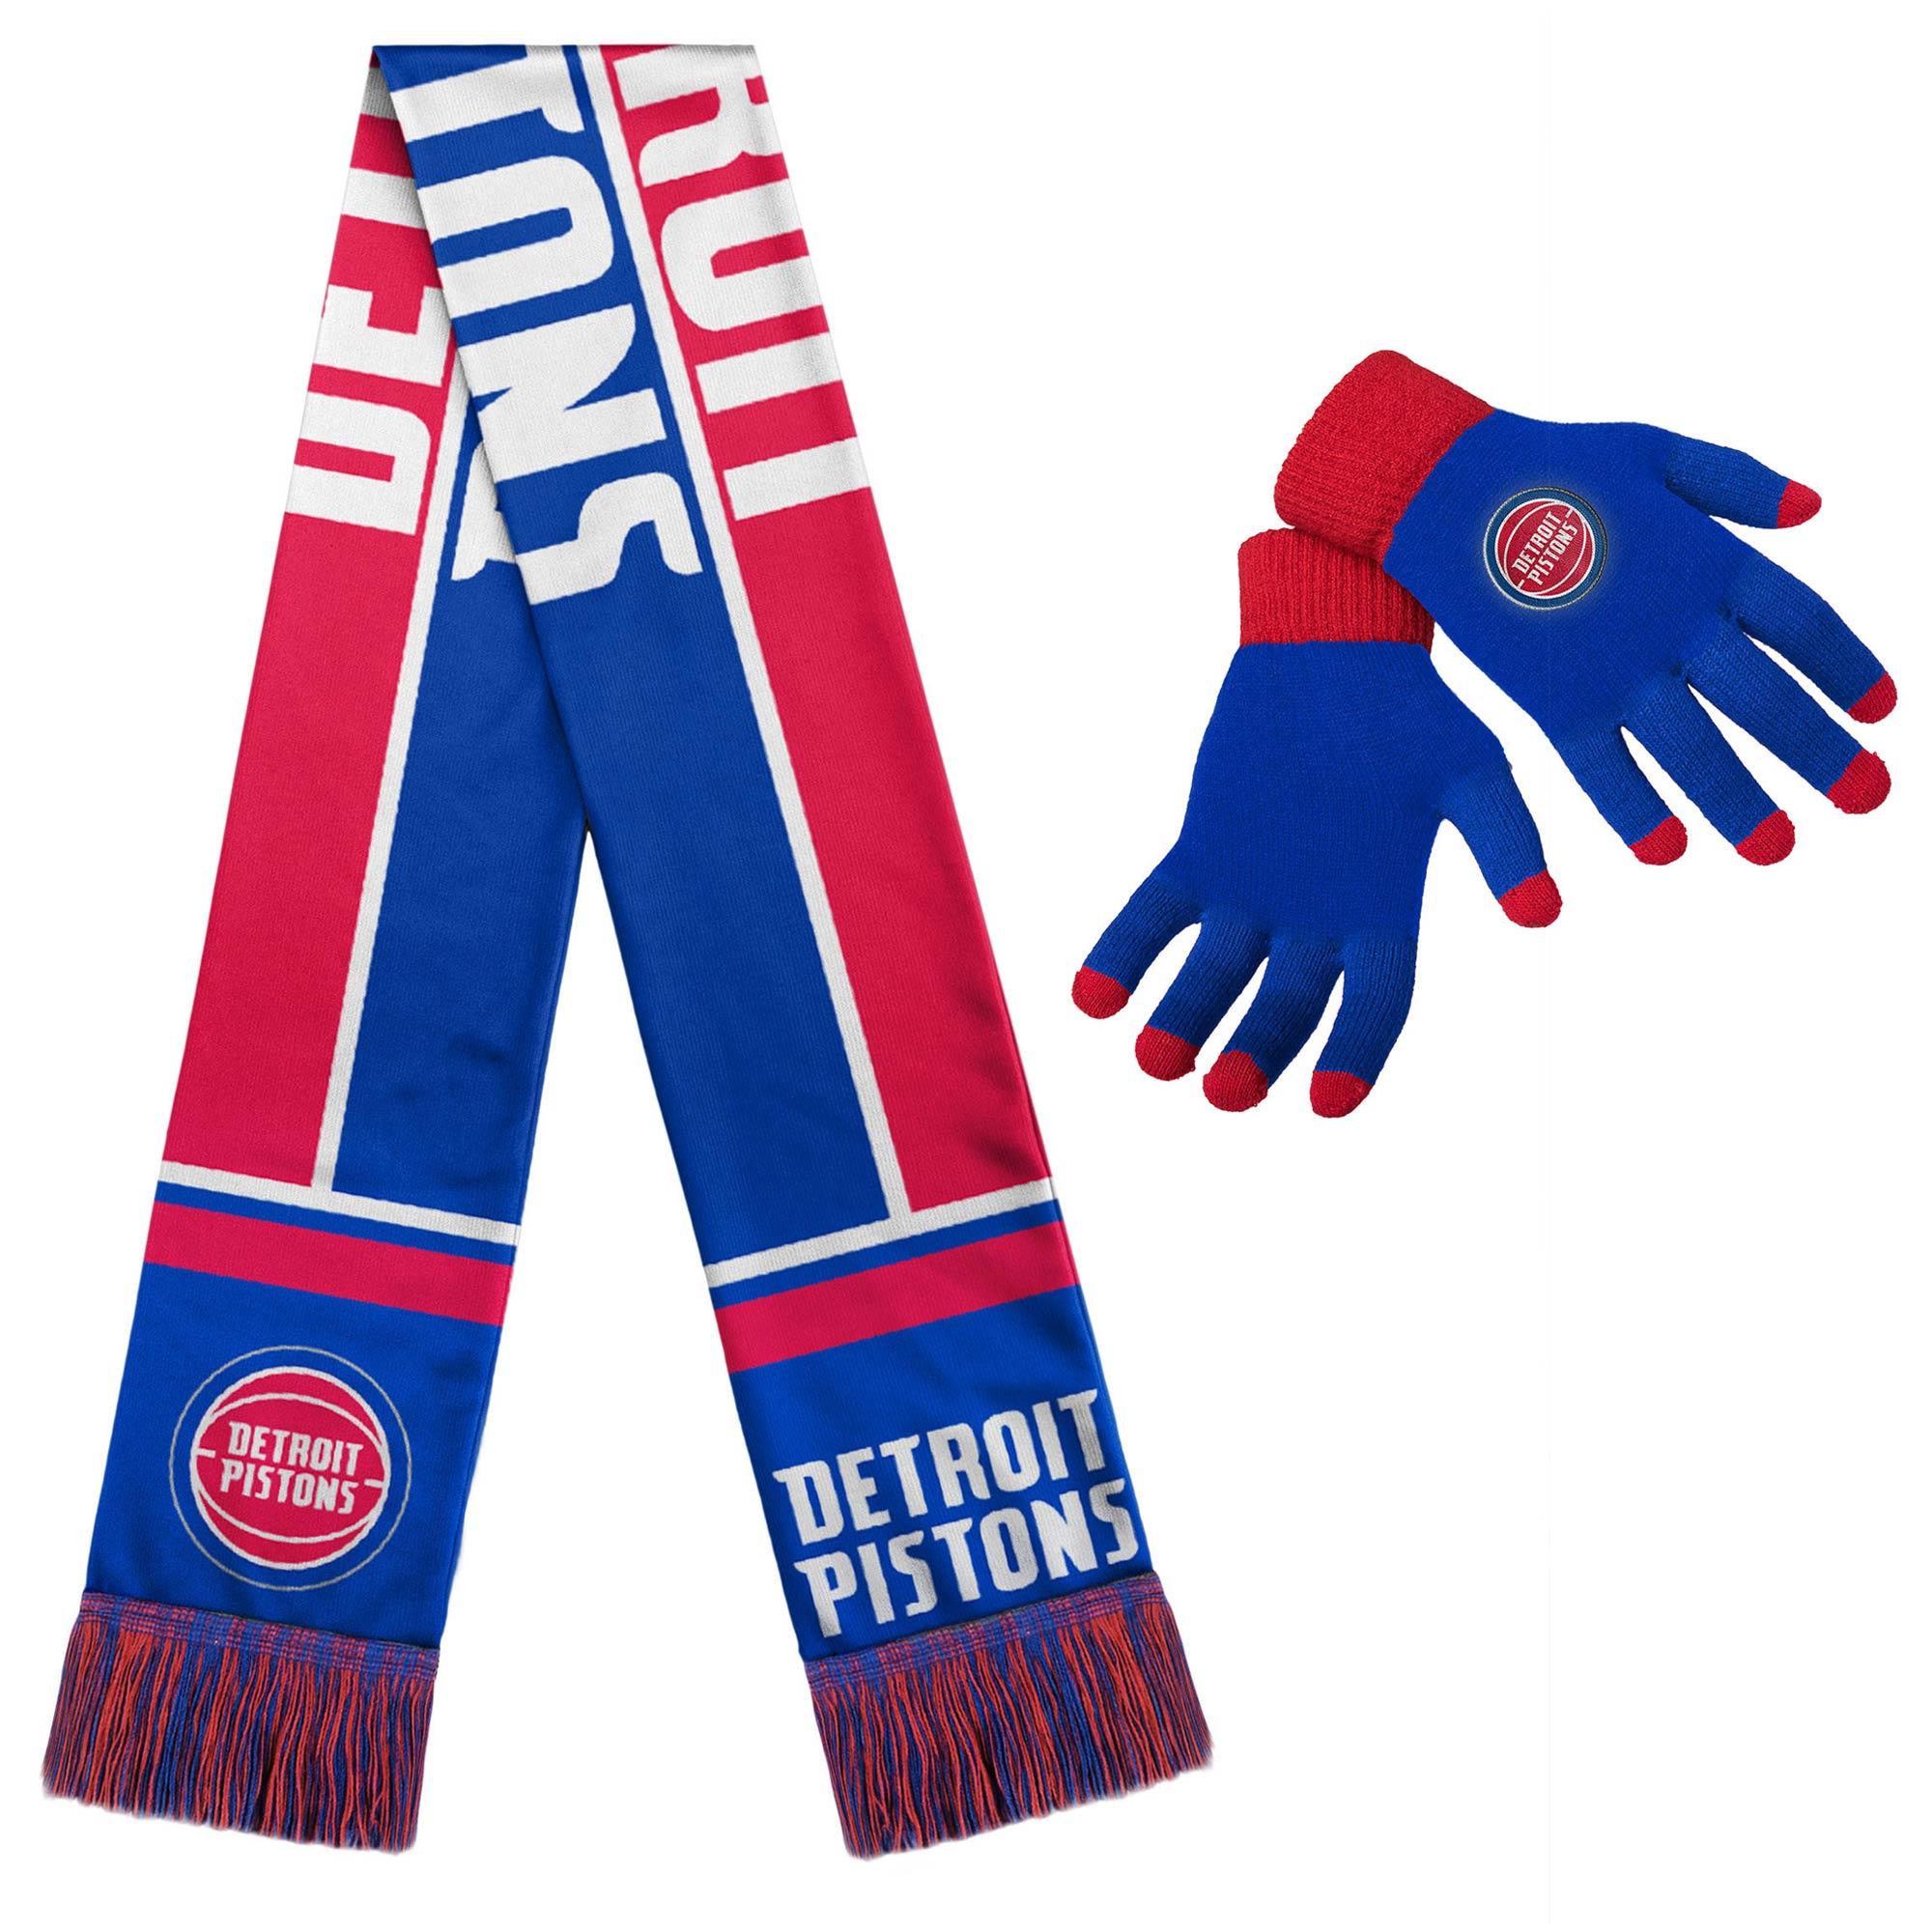 Detroit Pistons Gloves & Scarf Set